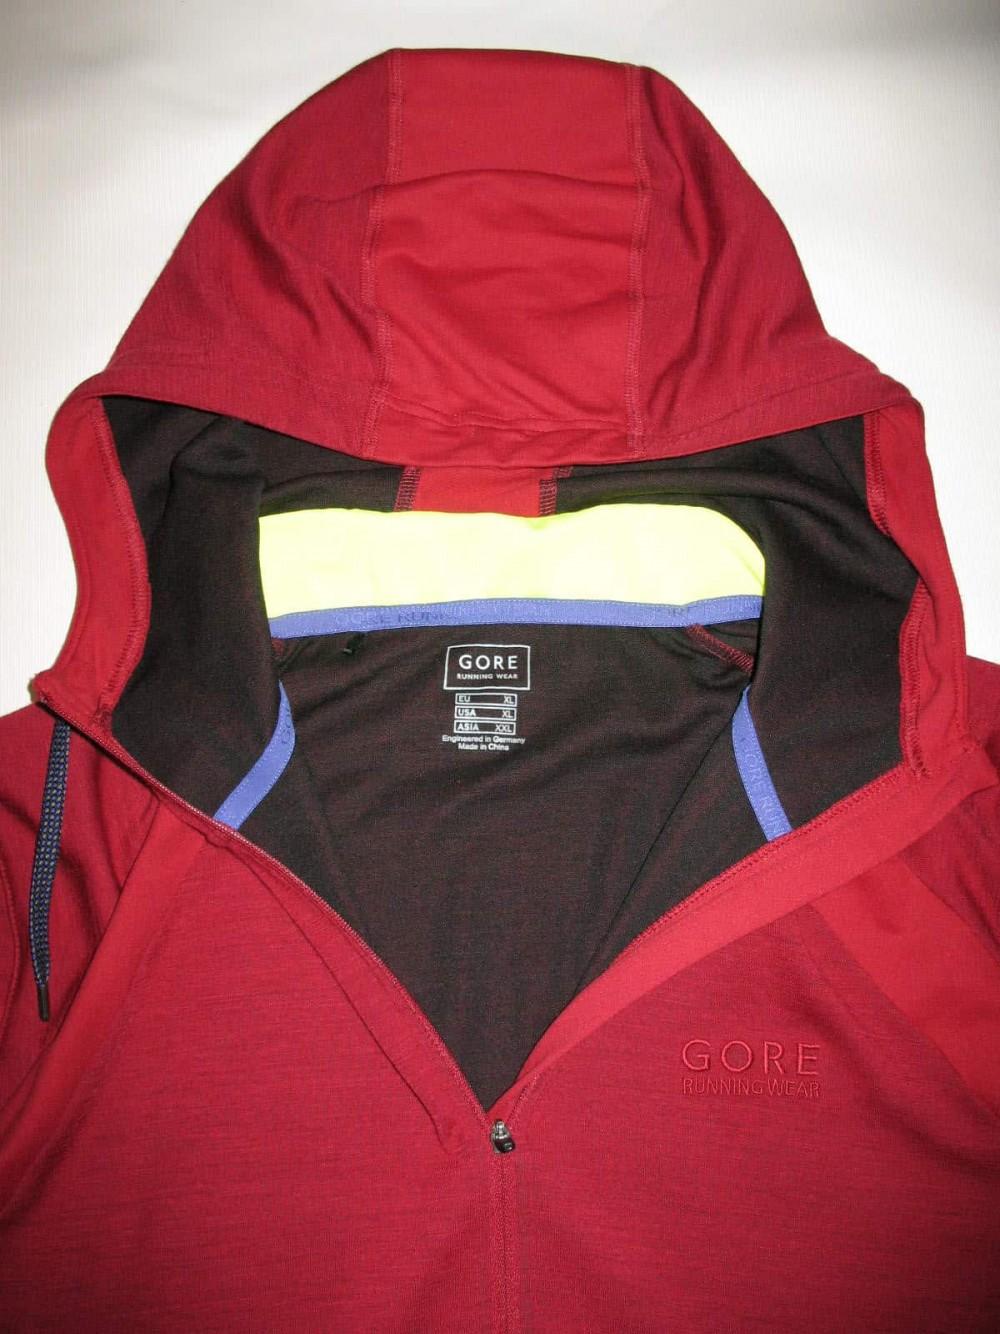 Кофта GORE running wear hooded running jacket (размер XXL) - 9